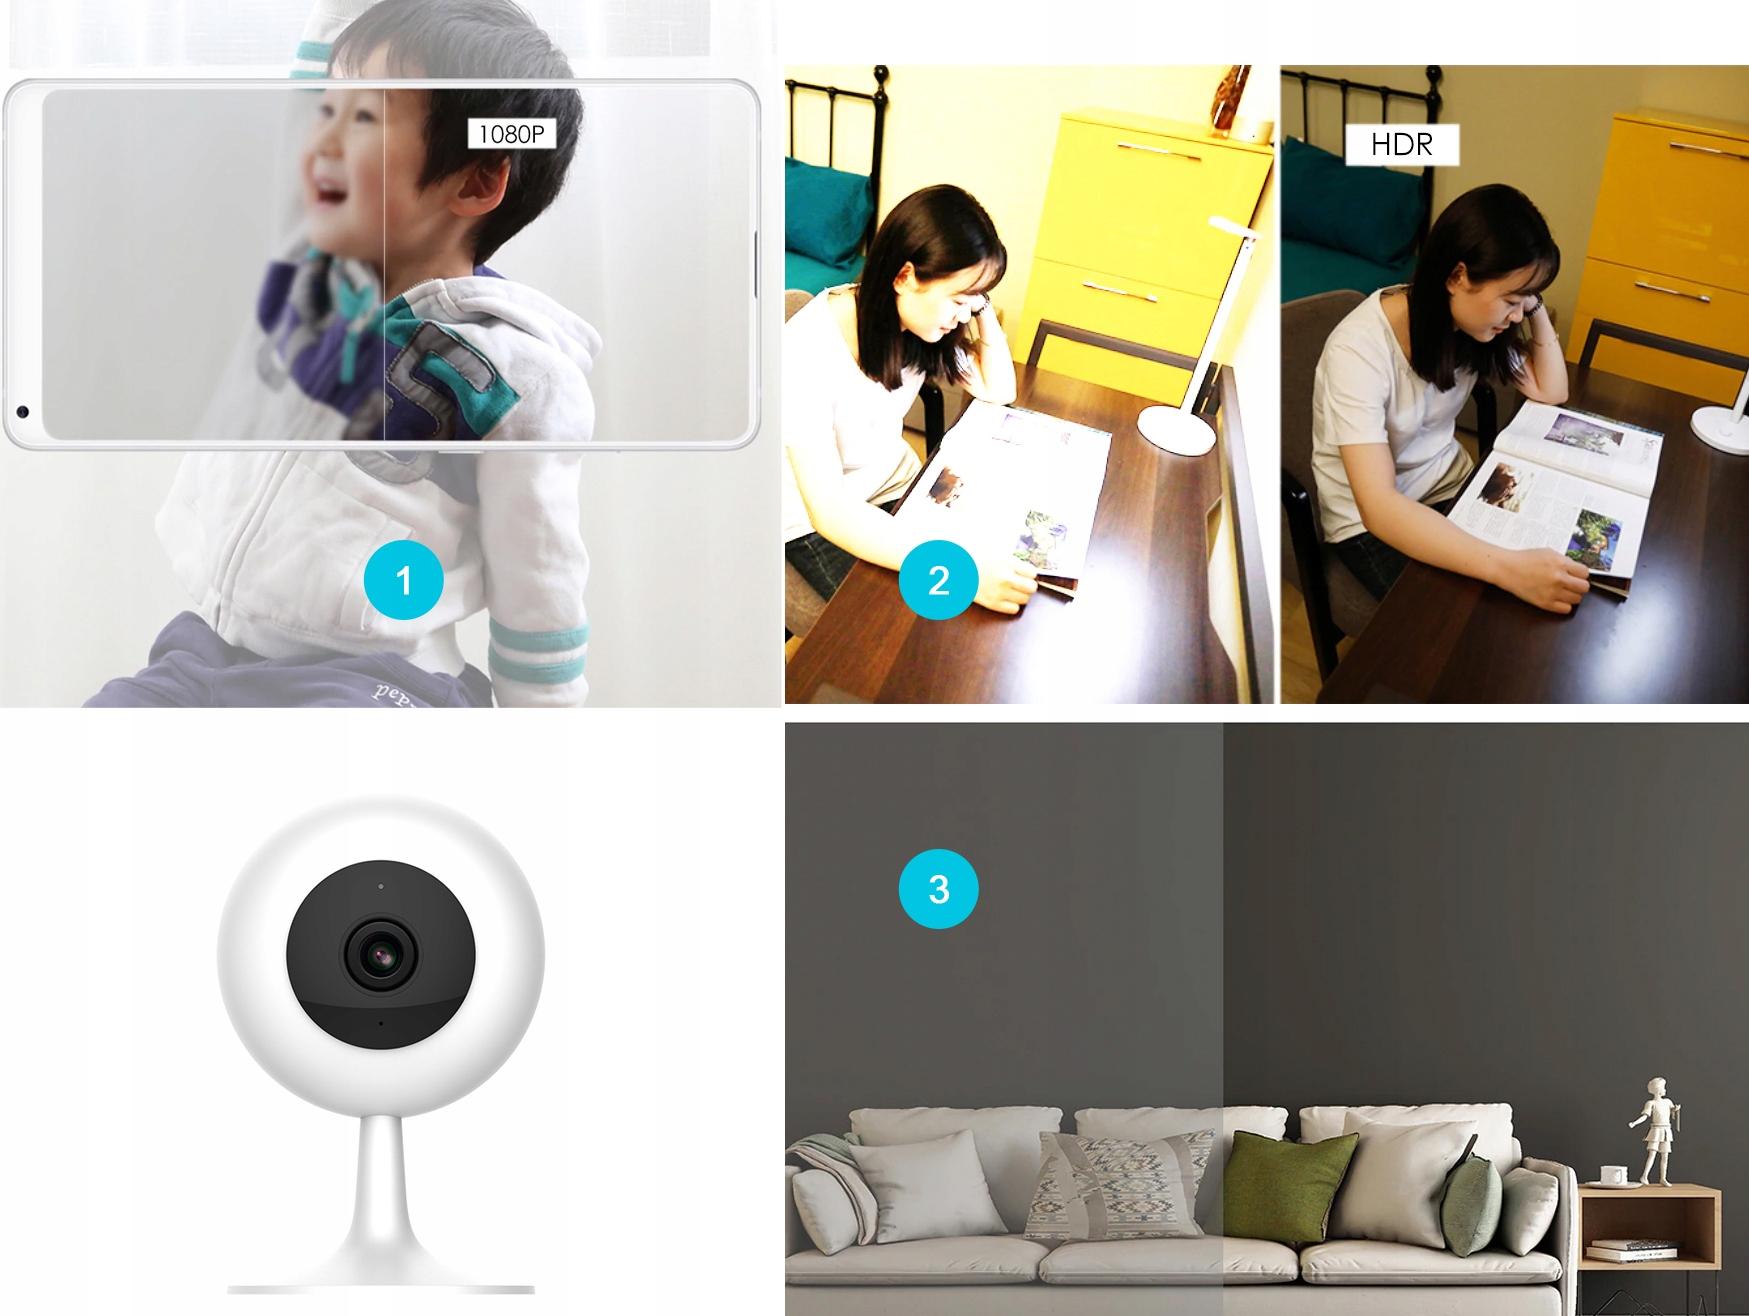 IMILAB MI HOME 1080p H.265 Kamera IP 64GB NIANIA Obudowa kopułkowa (dome)